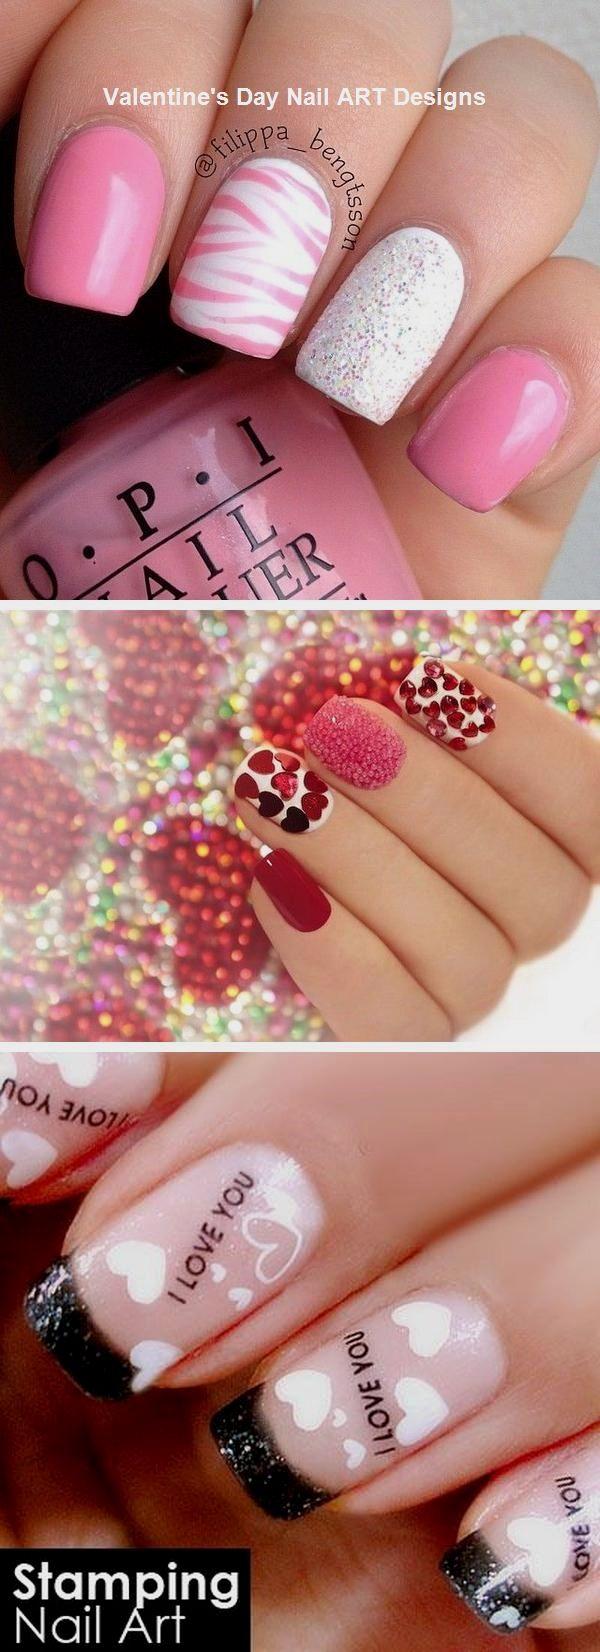 Best Nail Art Design Ideas for Valentines Day #valentinesday #naildesign